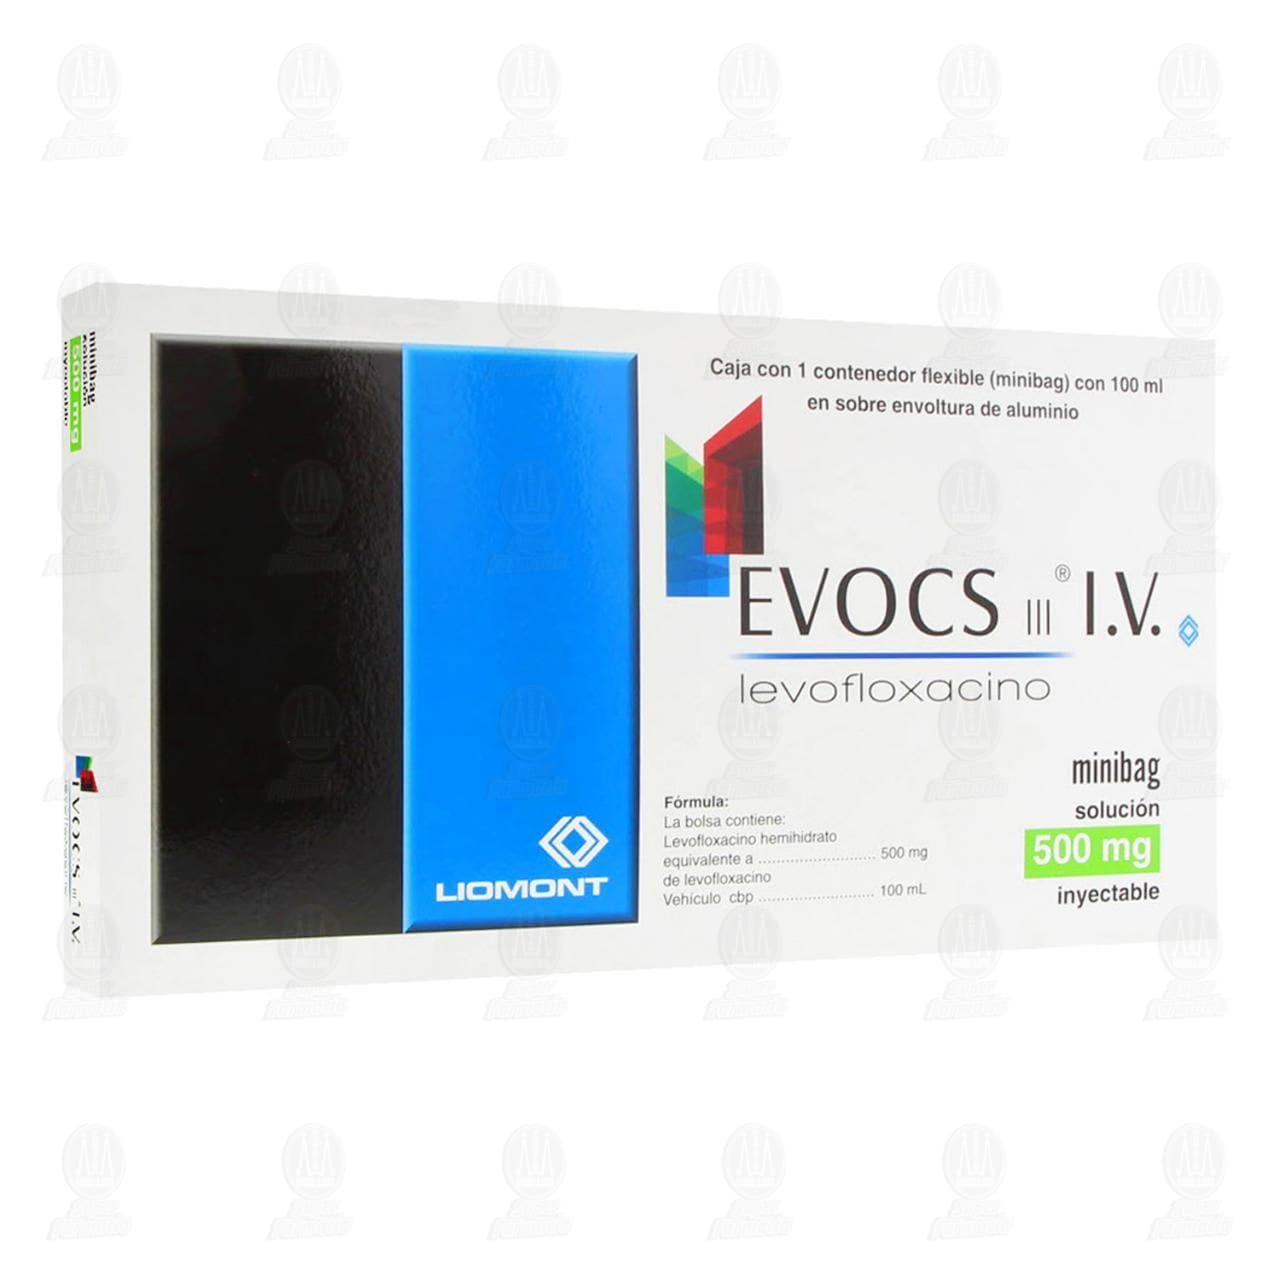 Comprar Evocs III 500mg Minibag Inyectable 100ml en Farmacias Guadalajara